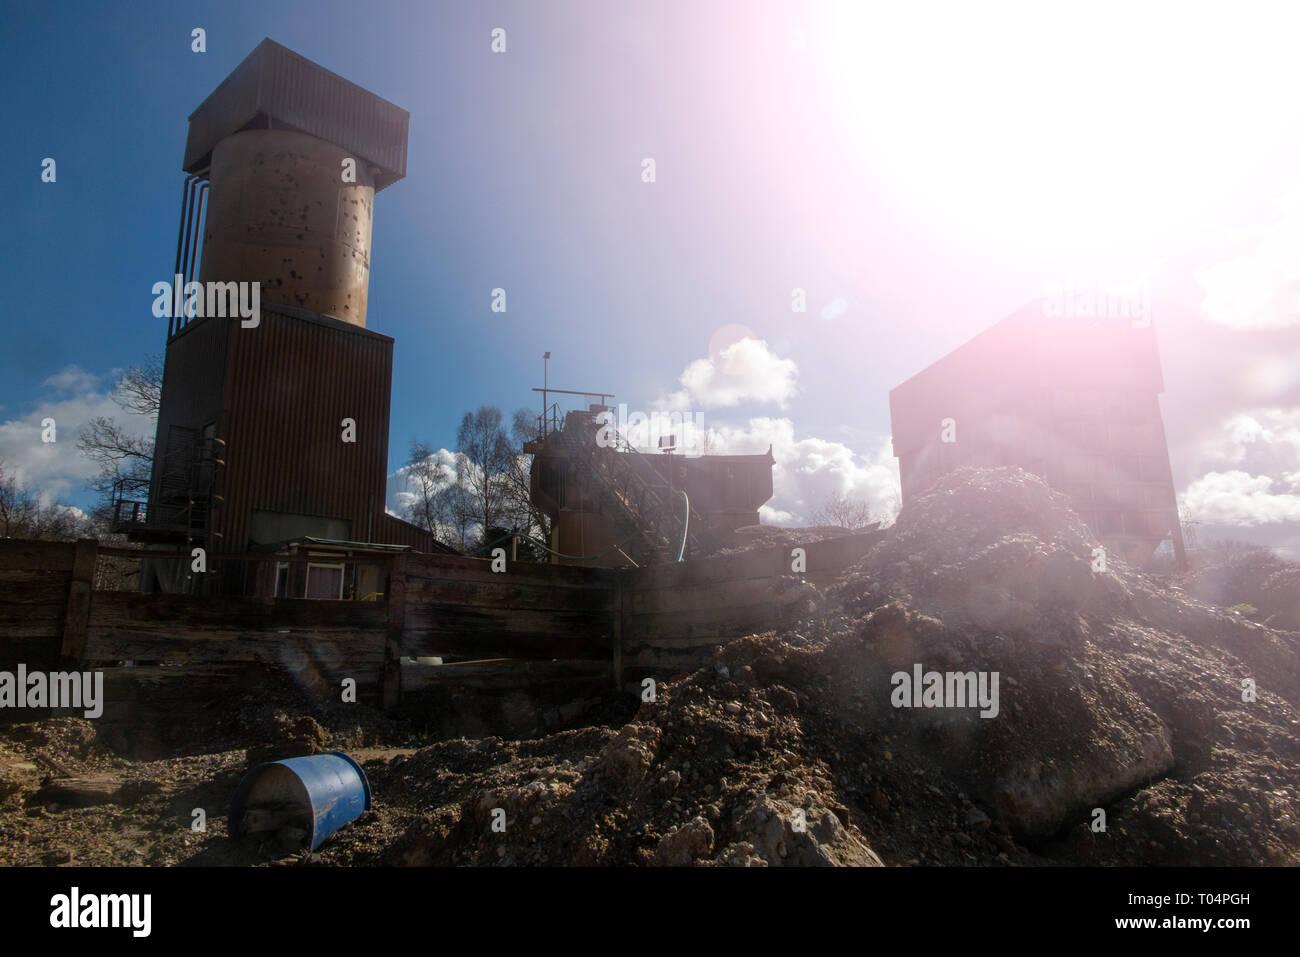 Cemex UK Eversley Concrete Plant, Quarry & Landfill - Stock Image